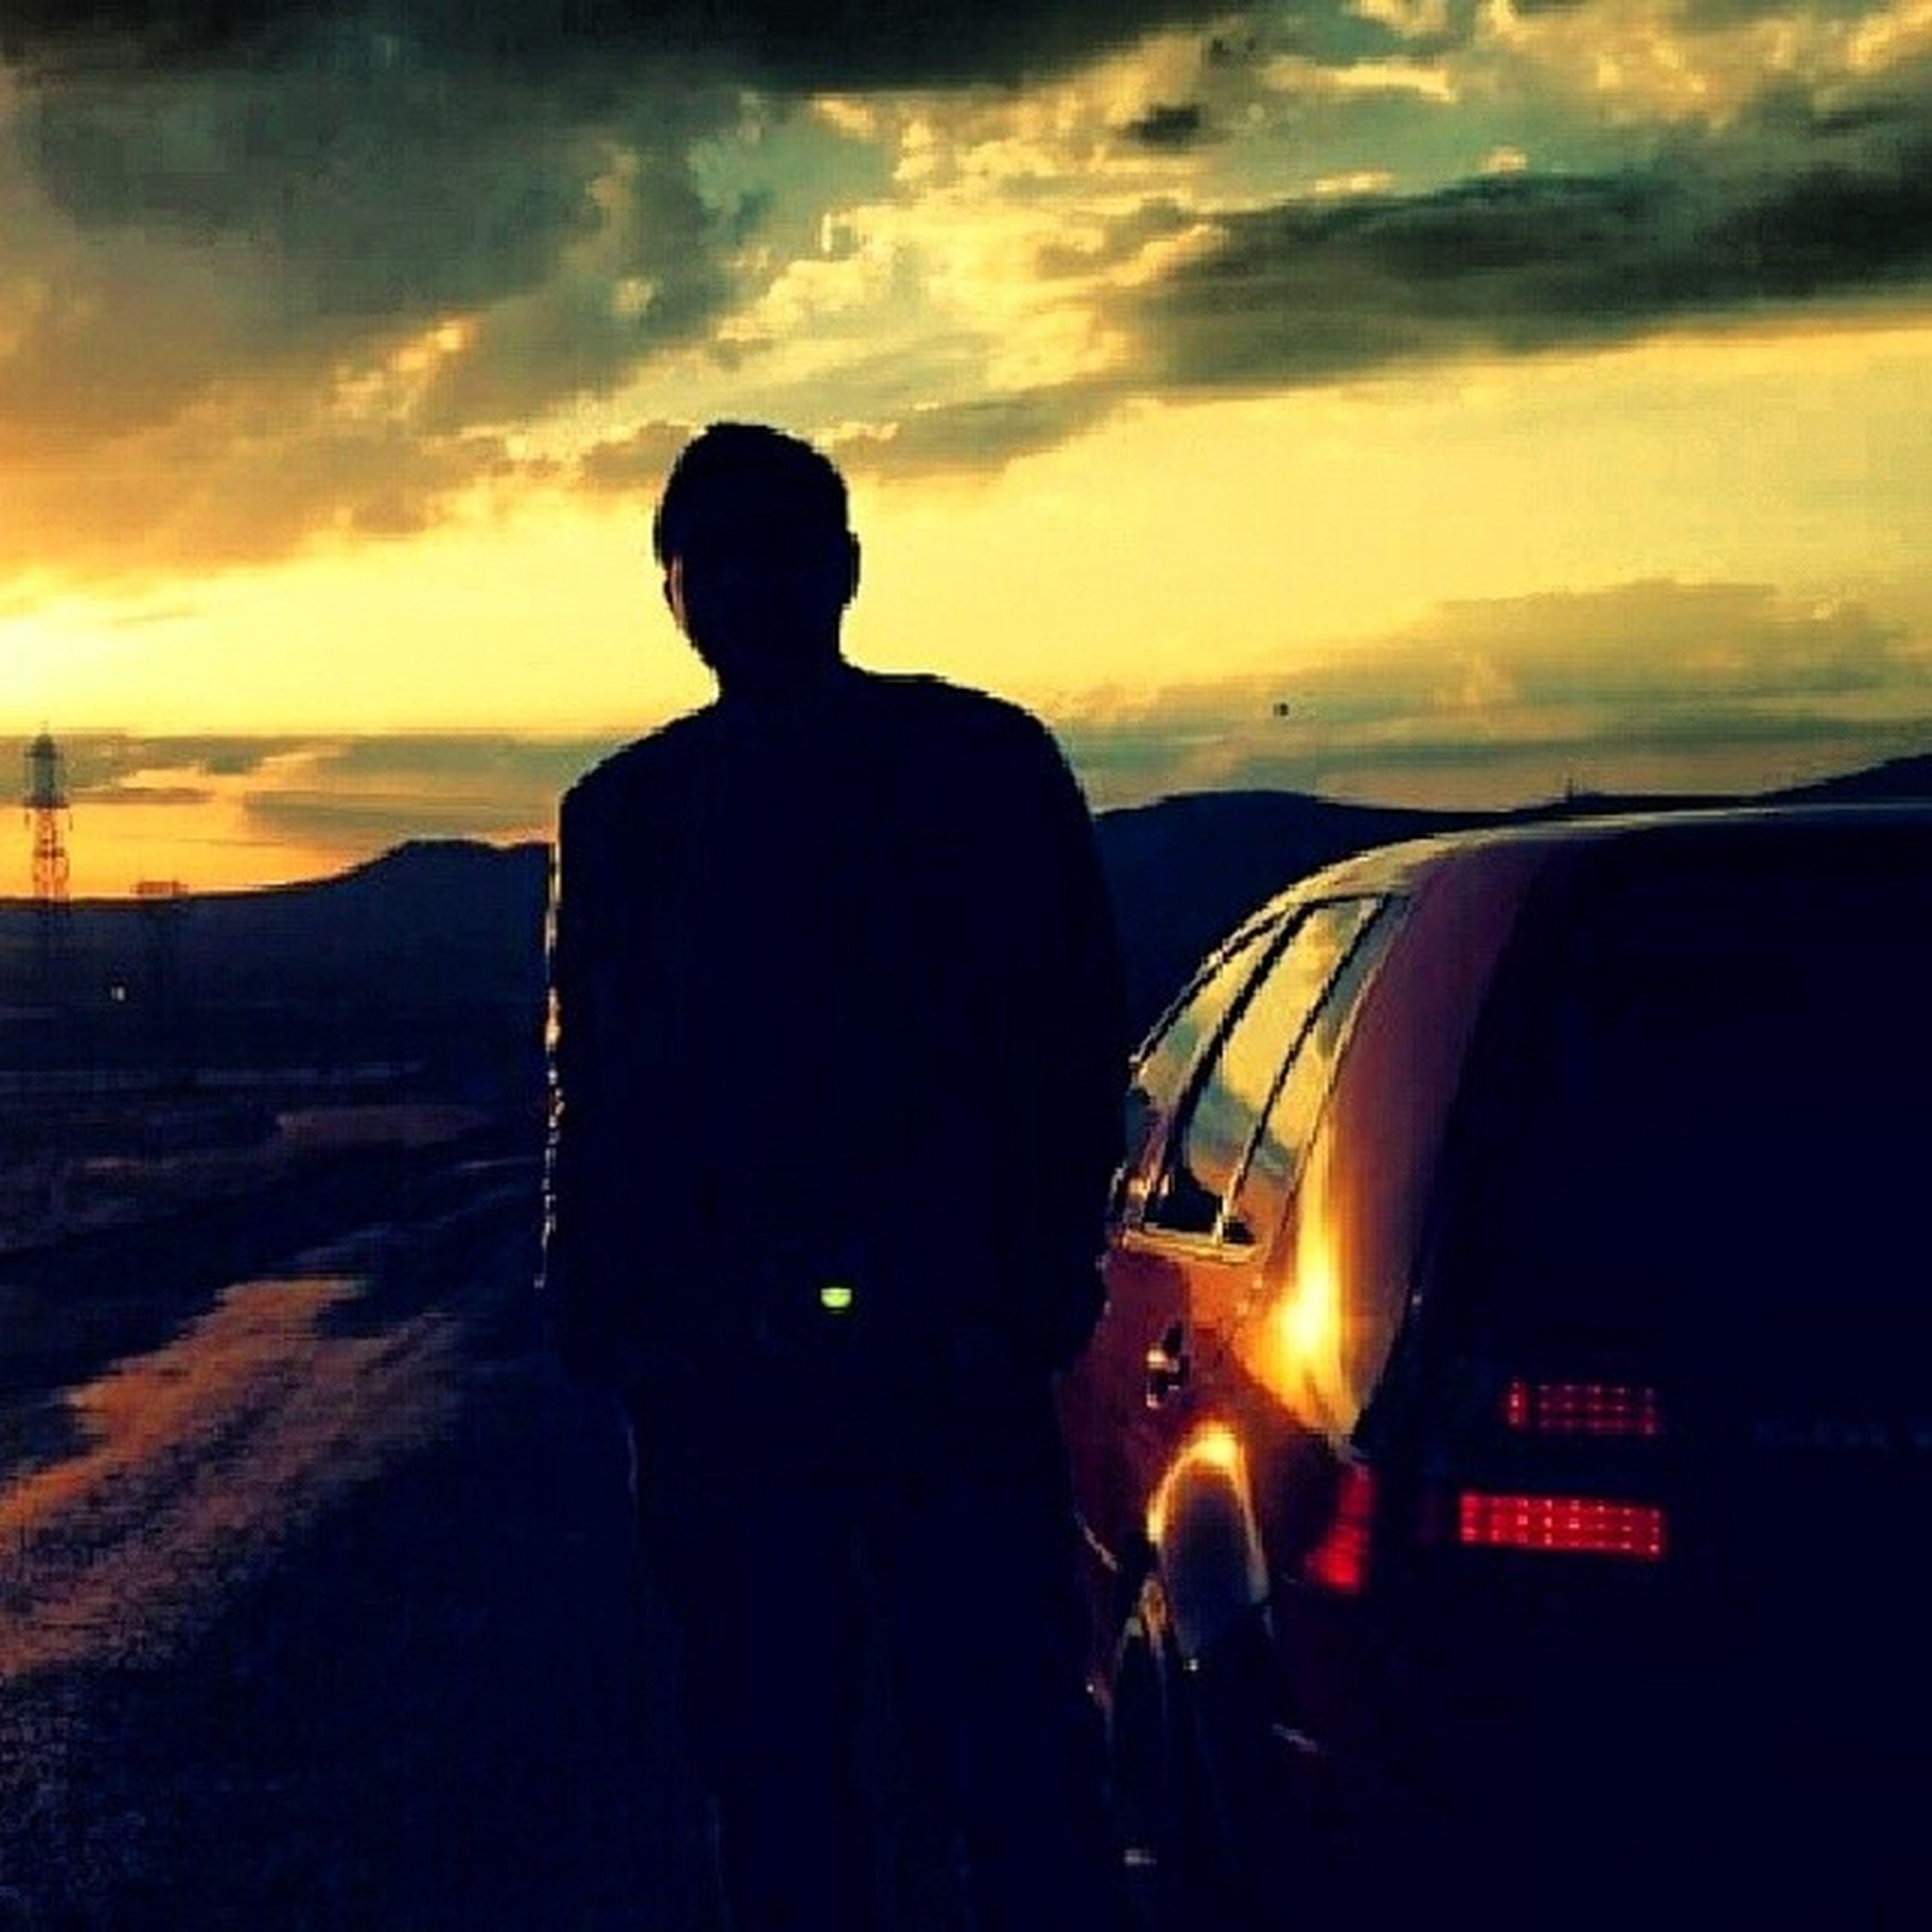 sunset, silhouette, sky, men, lifestyles, cloud - sky, orange color, leisure activity, standing, mountain, rear view, person, cloud, beauty in nature, dusk, scenics, nature